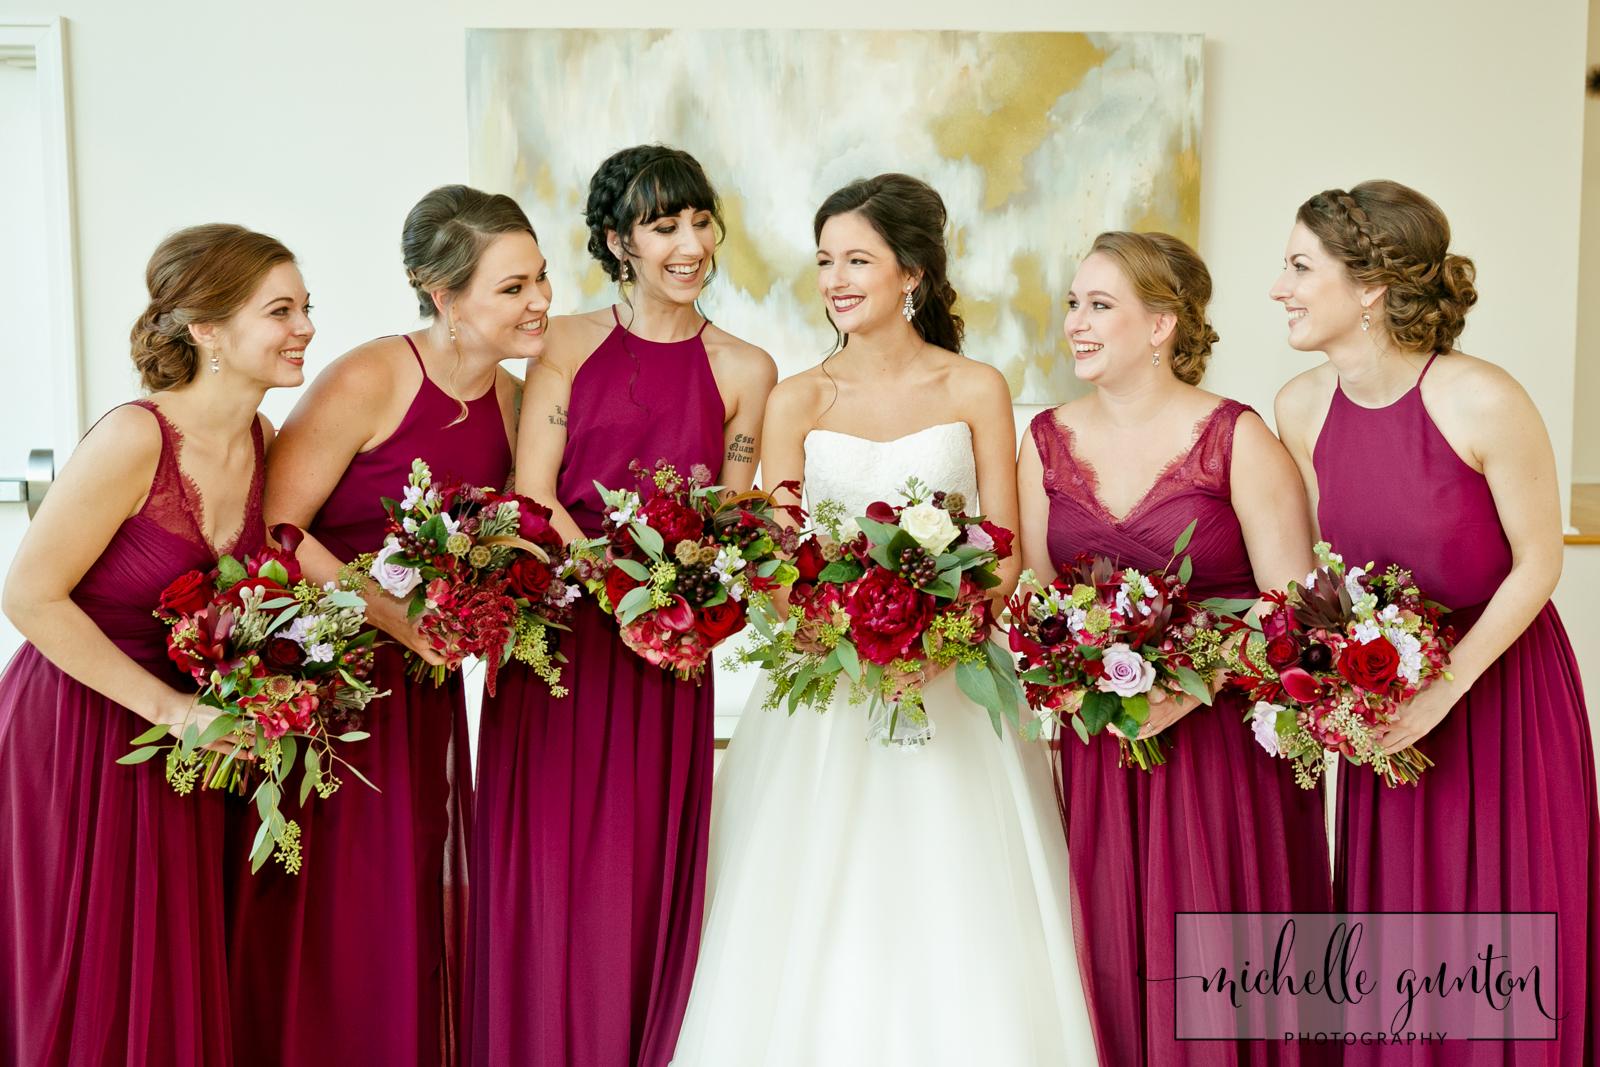 02 Michelle Gunton Photography Raleigh Wedding Photographer.jpg